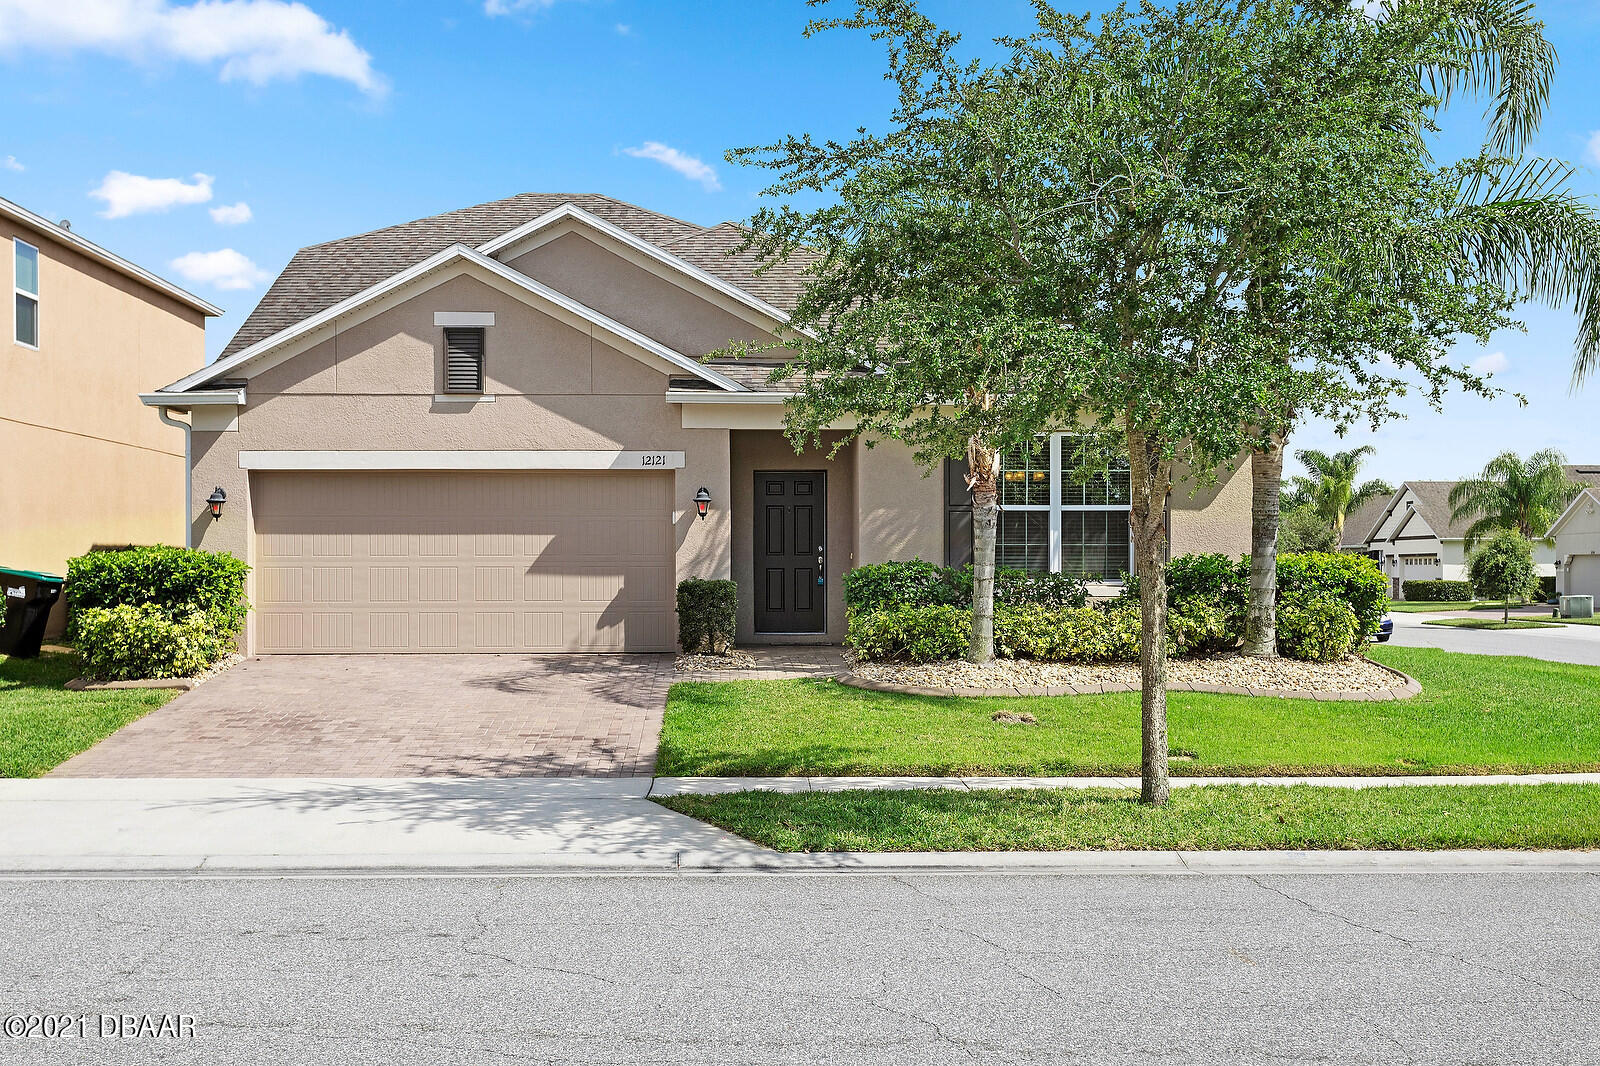 12121 Homestead Park Lane, ORLANDO, Florida 32824, 4 Bedrooms Bedrooms, ,3 BathroomsBathrooms,Single Family,For Sale,12121 Homestead Park Lane,2,1083387